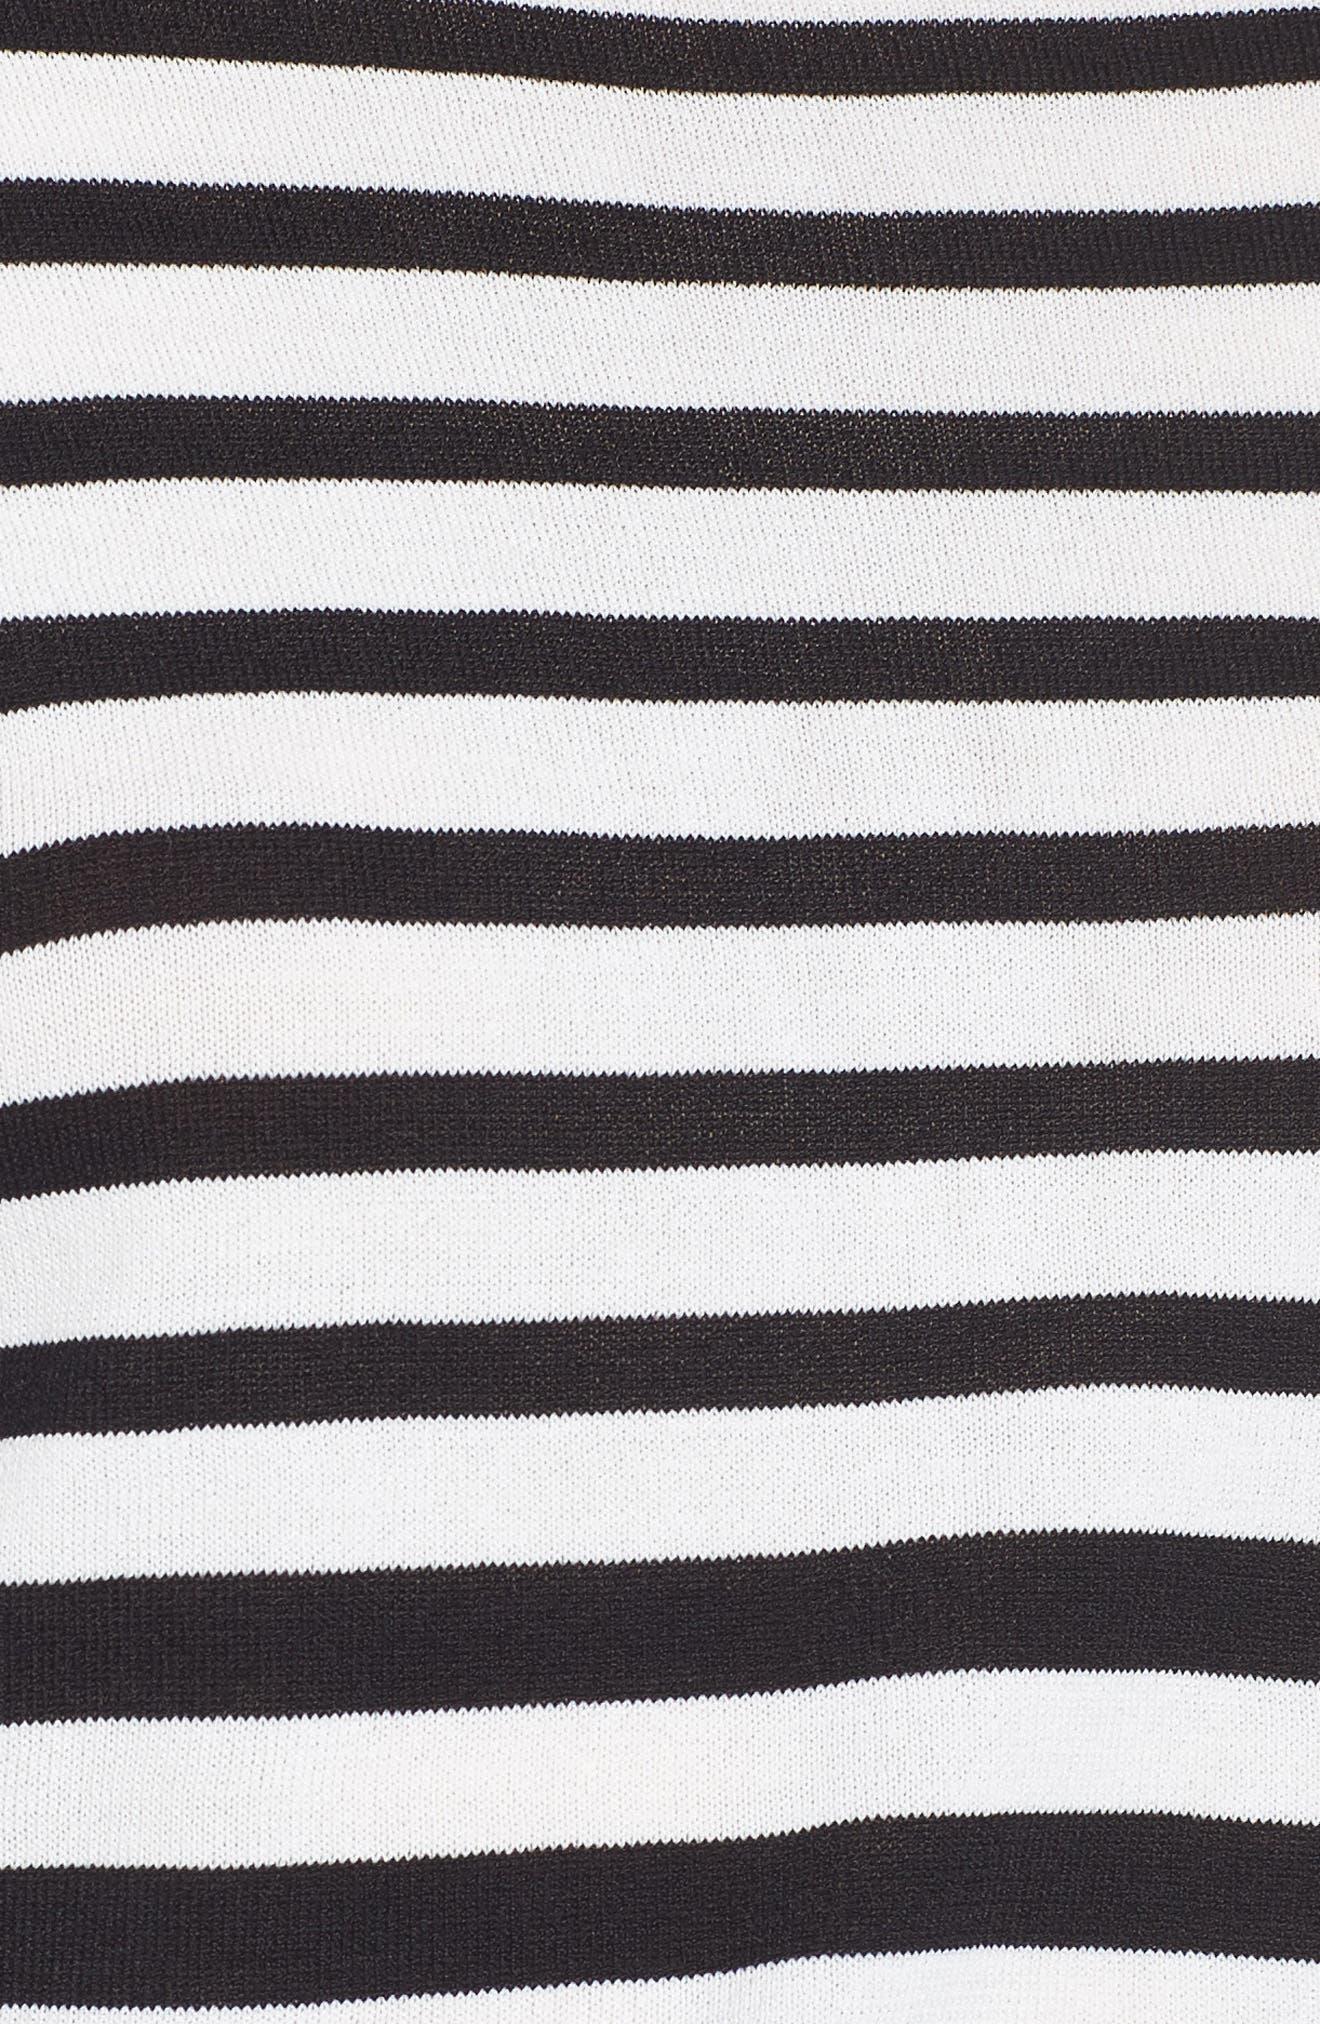 Marin Stripe Ruffle Sleeve Sweater,                             Alternate thumbnail 6, color,                             White/Black